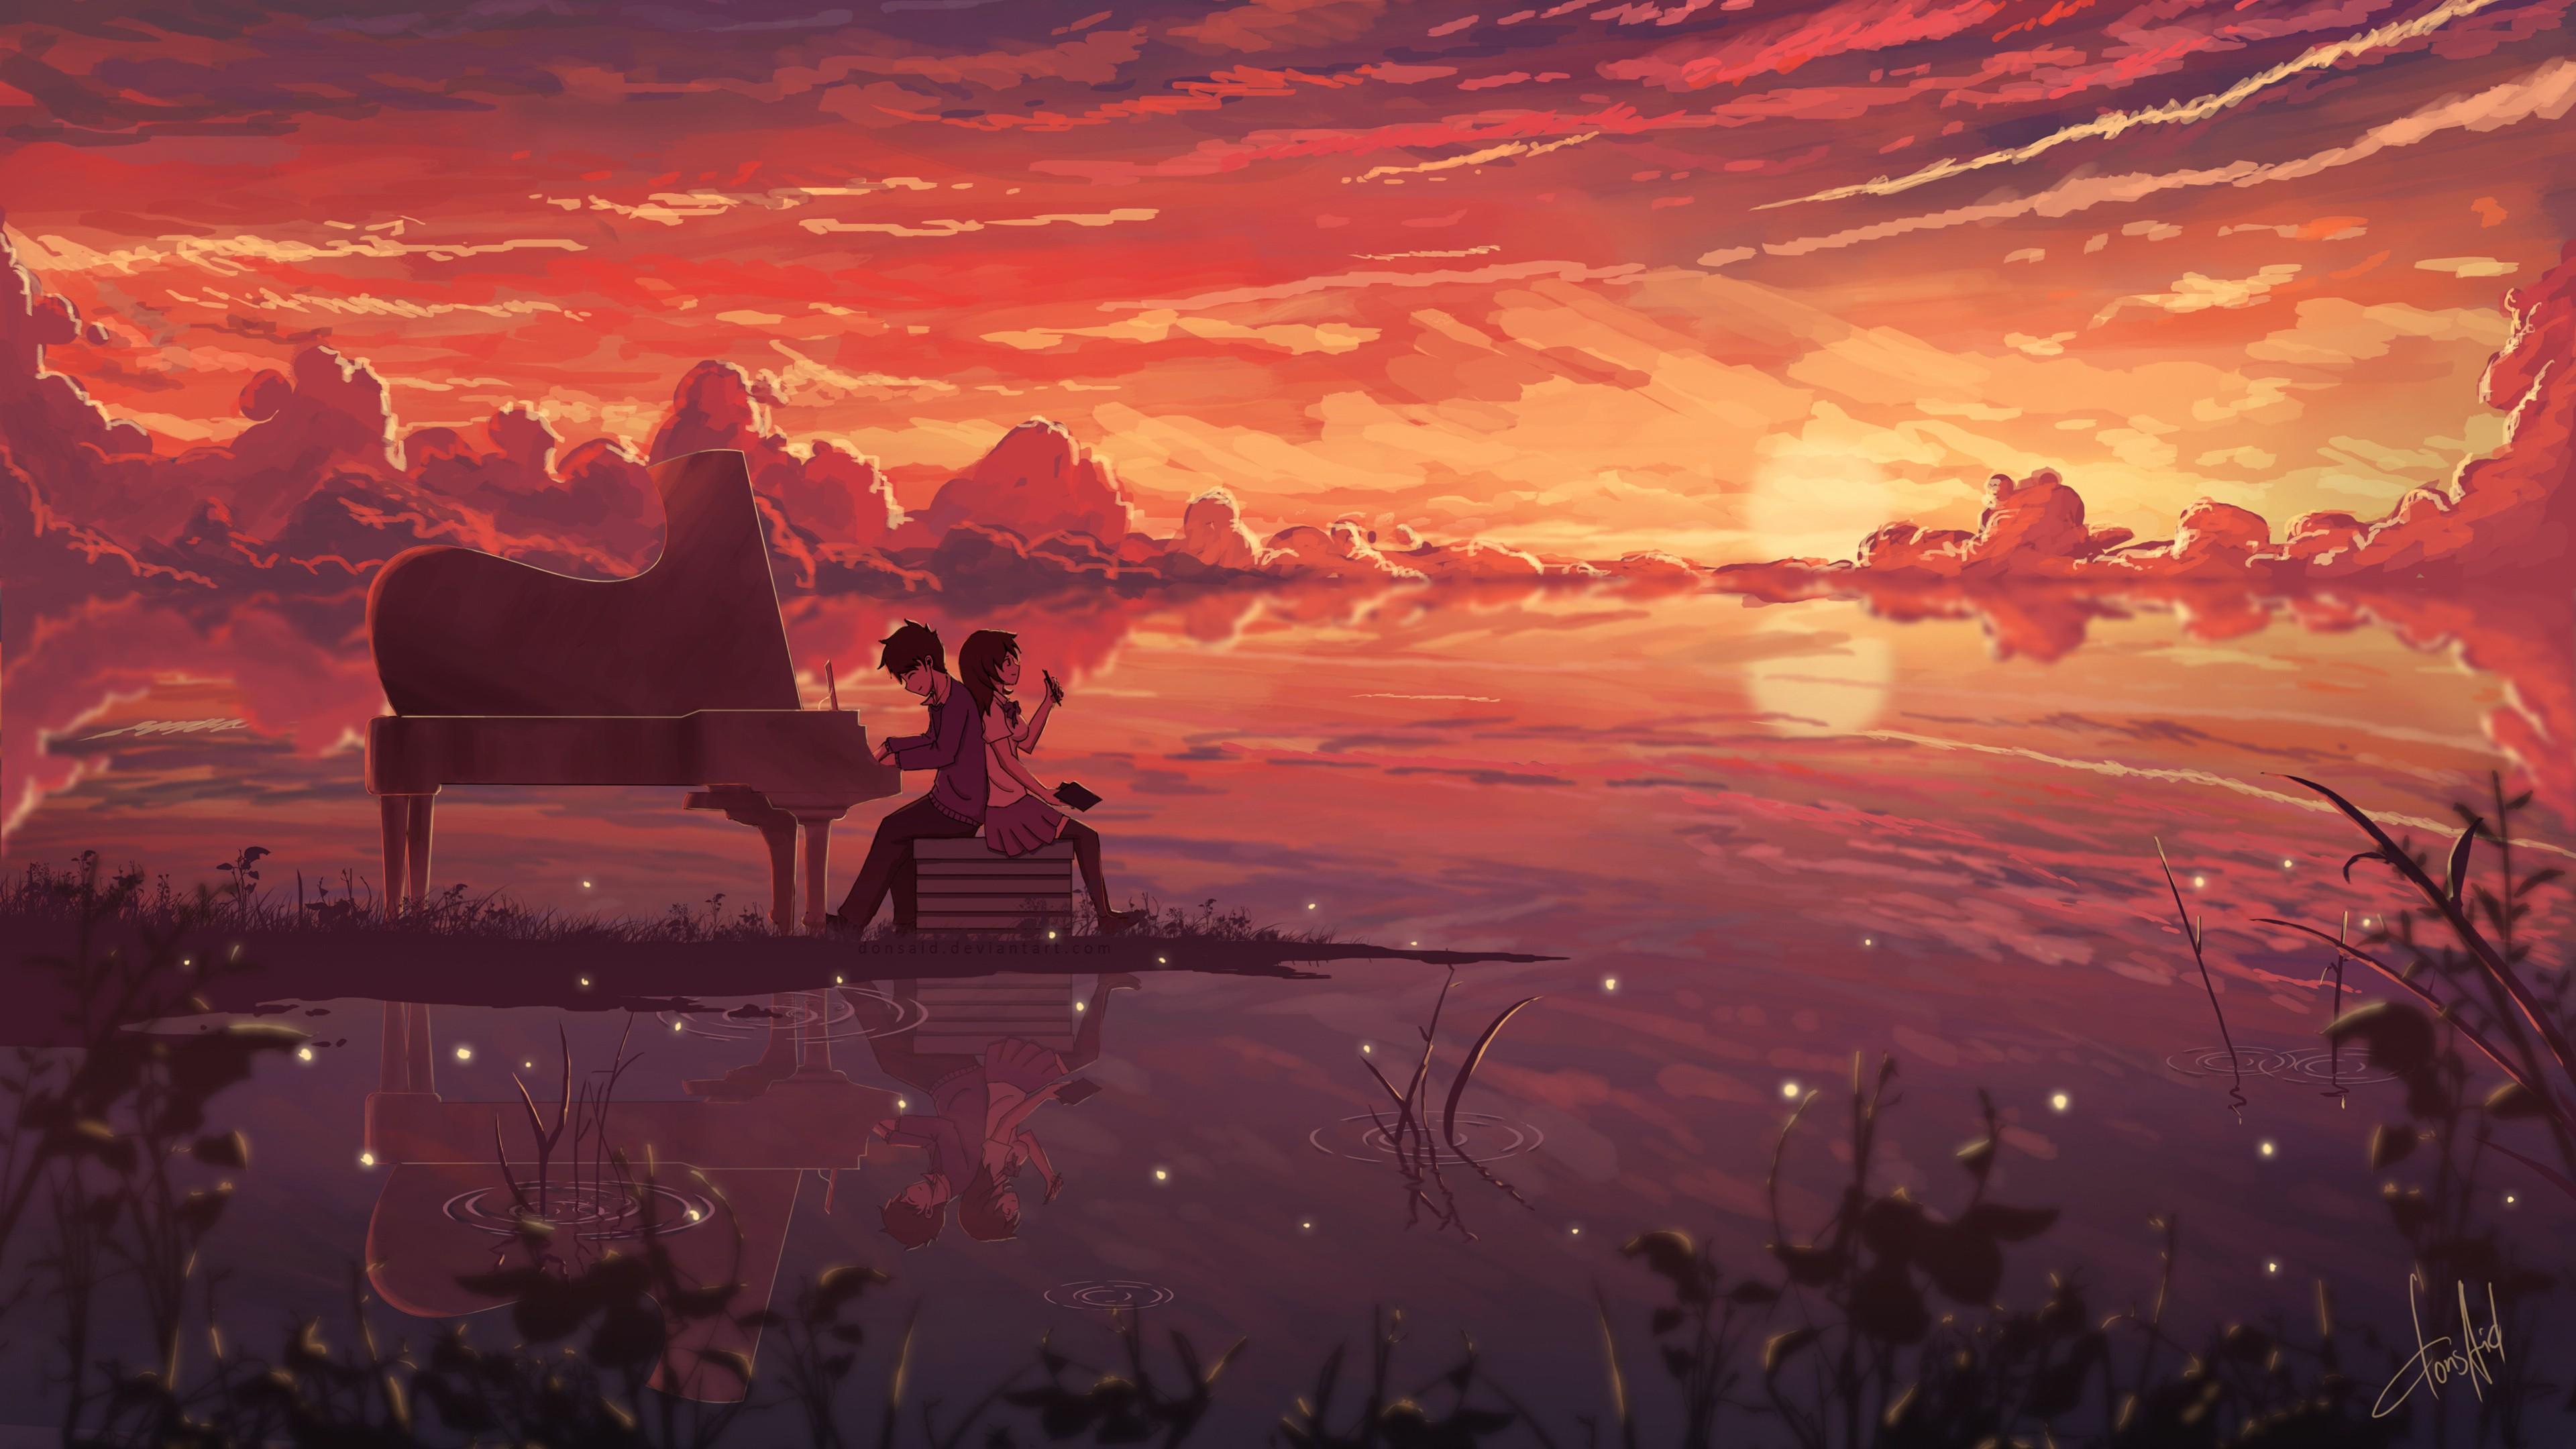 Anime 3840x2160 anime girls anime boys piano anime sky outdoors sunlight reflection water